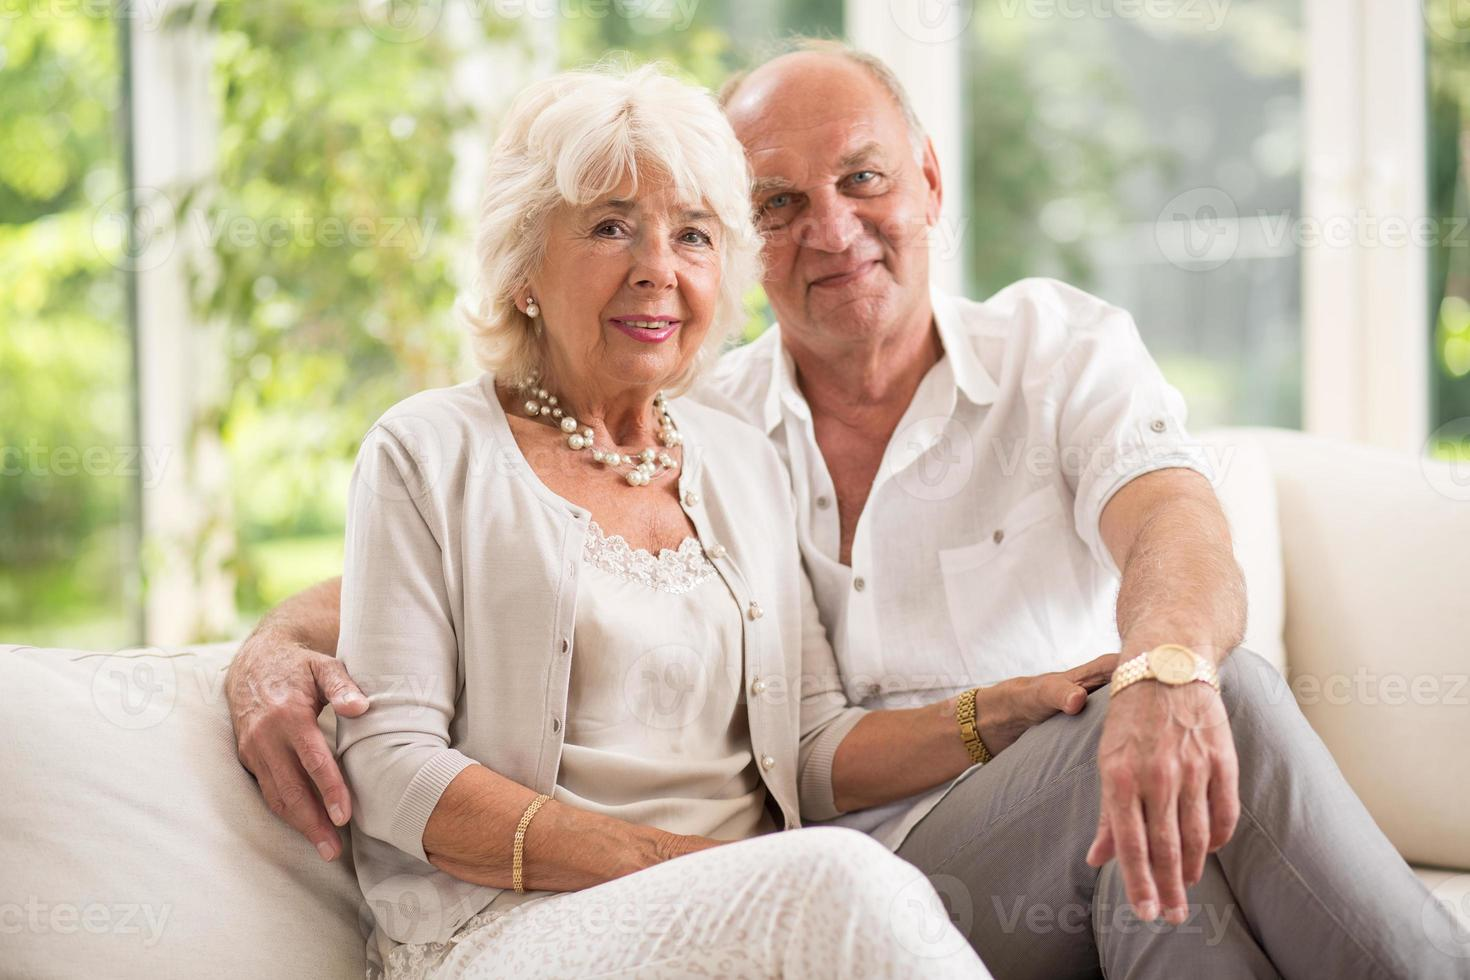 Amorous senior couple photo